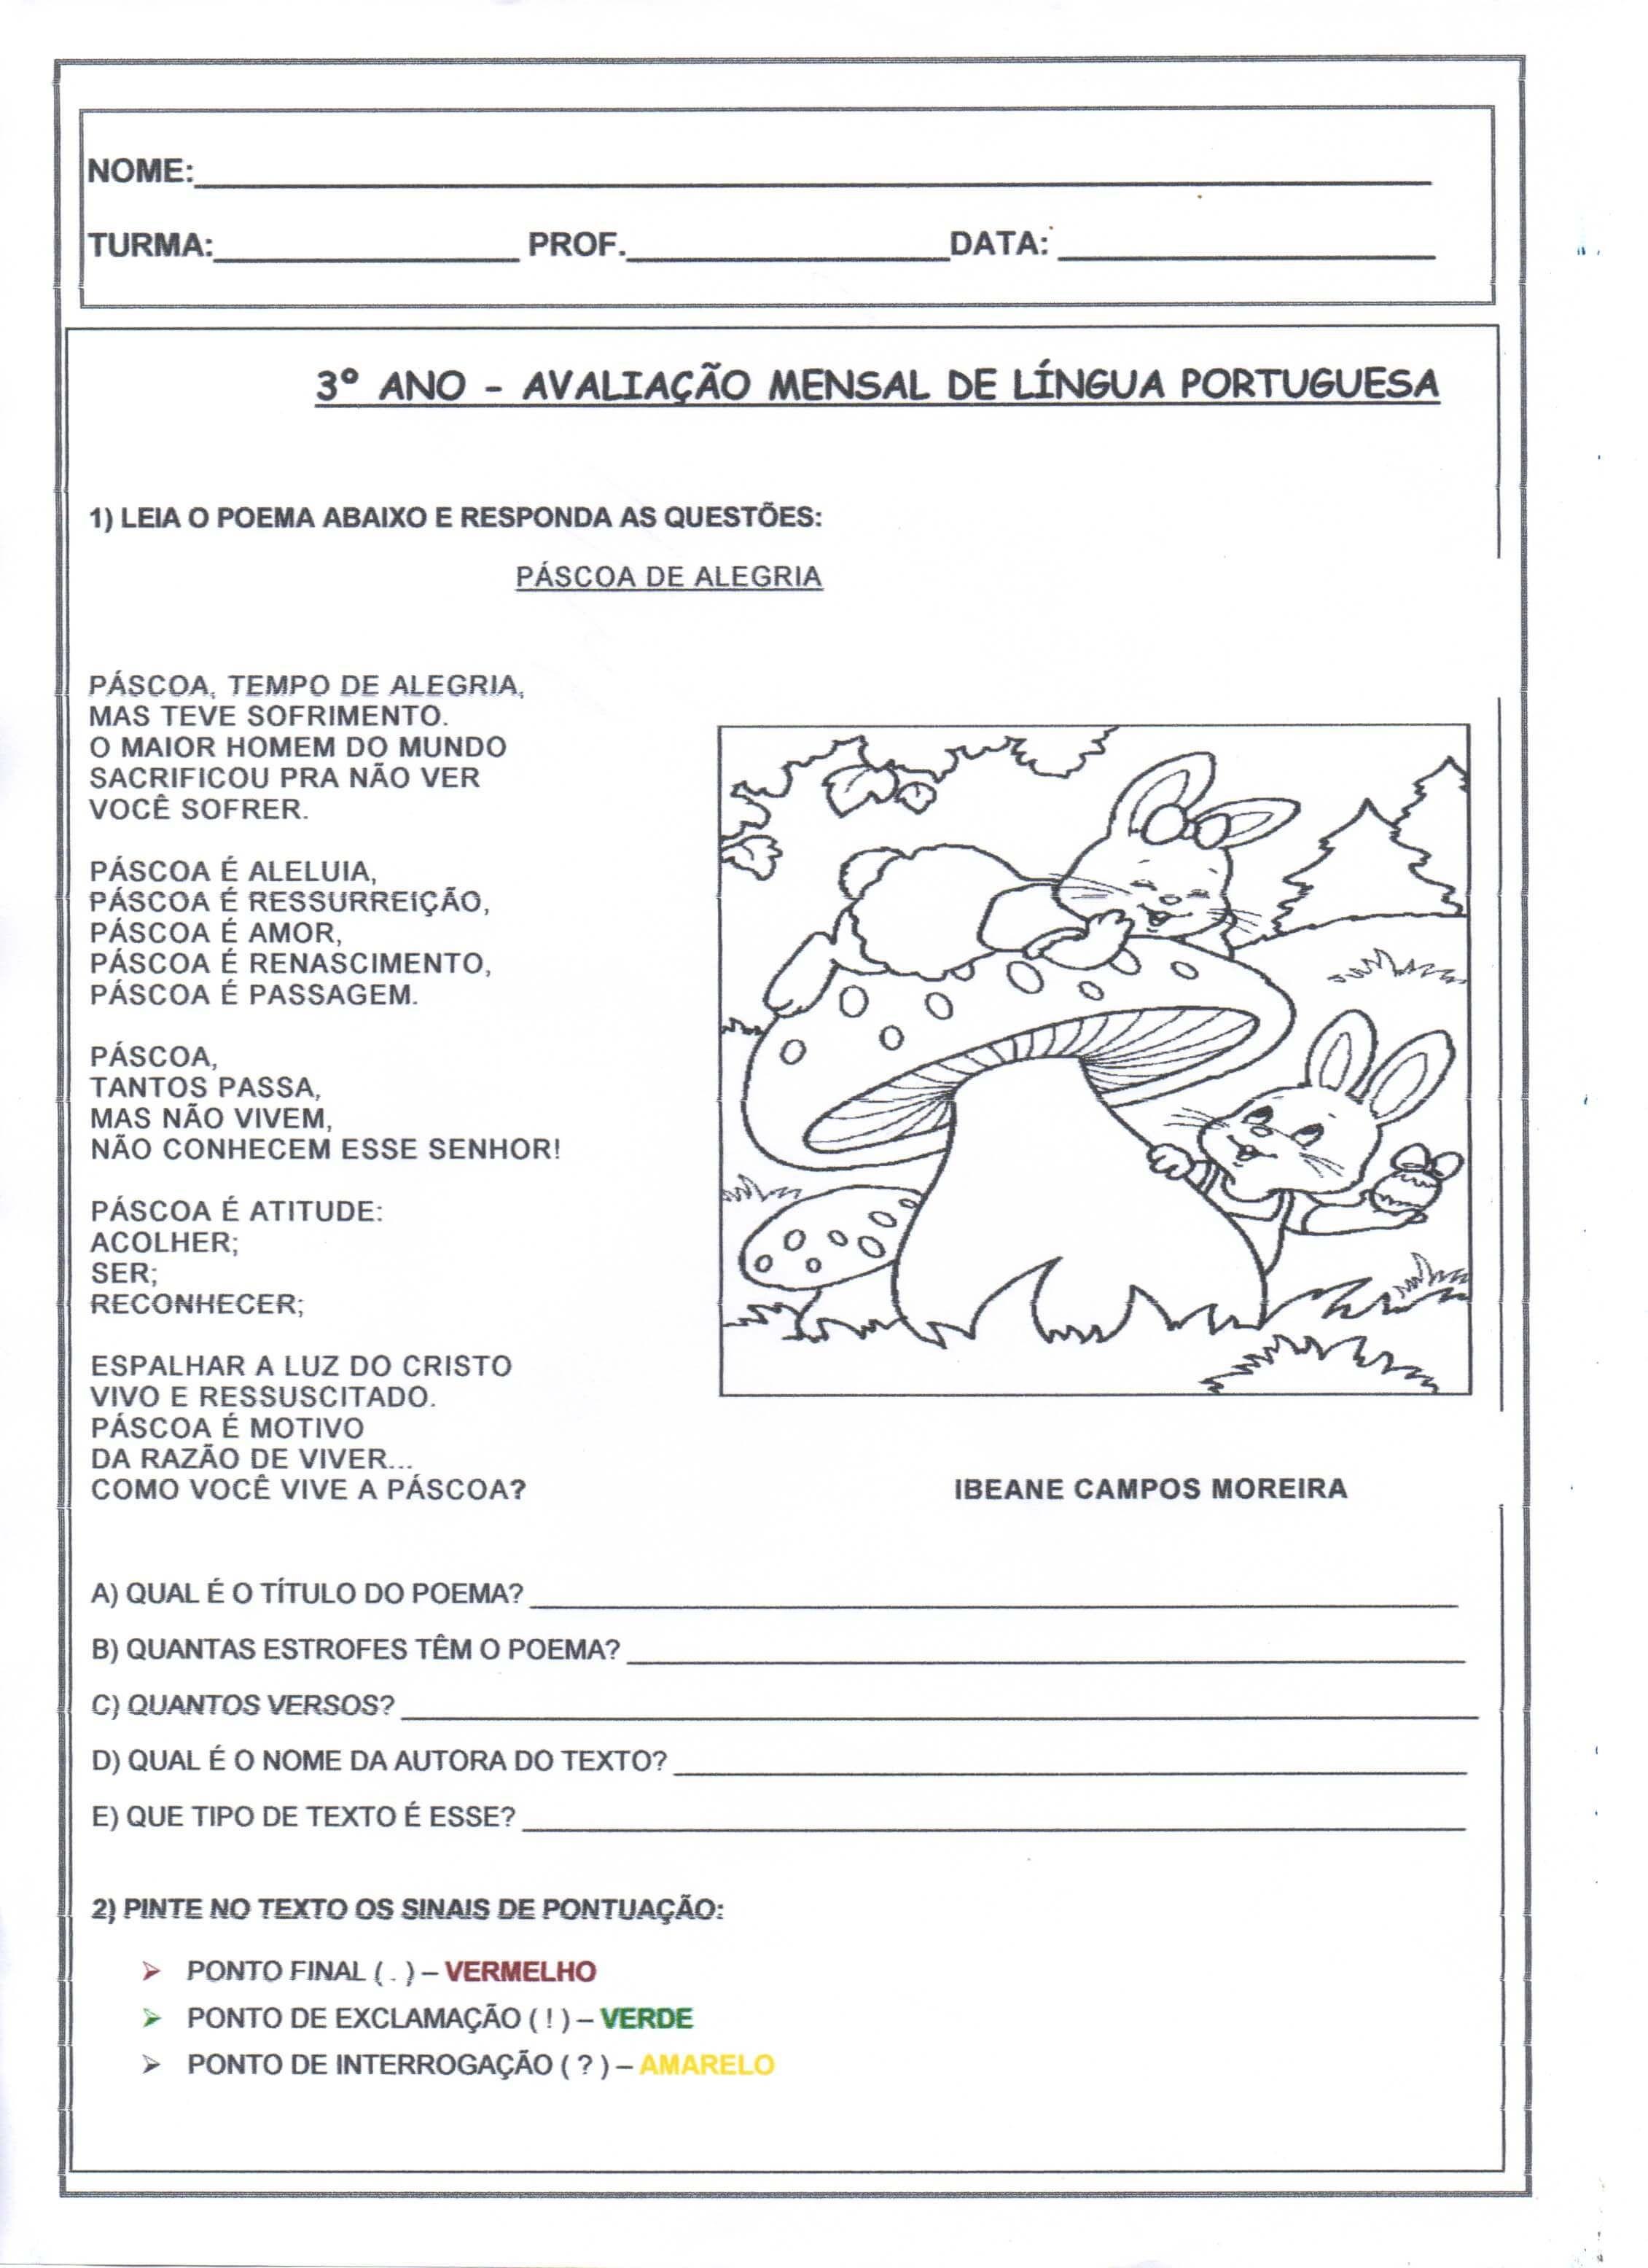 Avaliacao De Lingua Portuguesa 3 Ano Folha 14 4 1